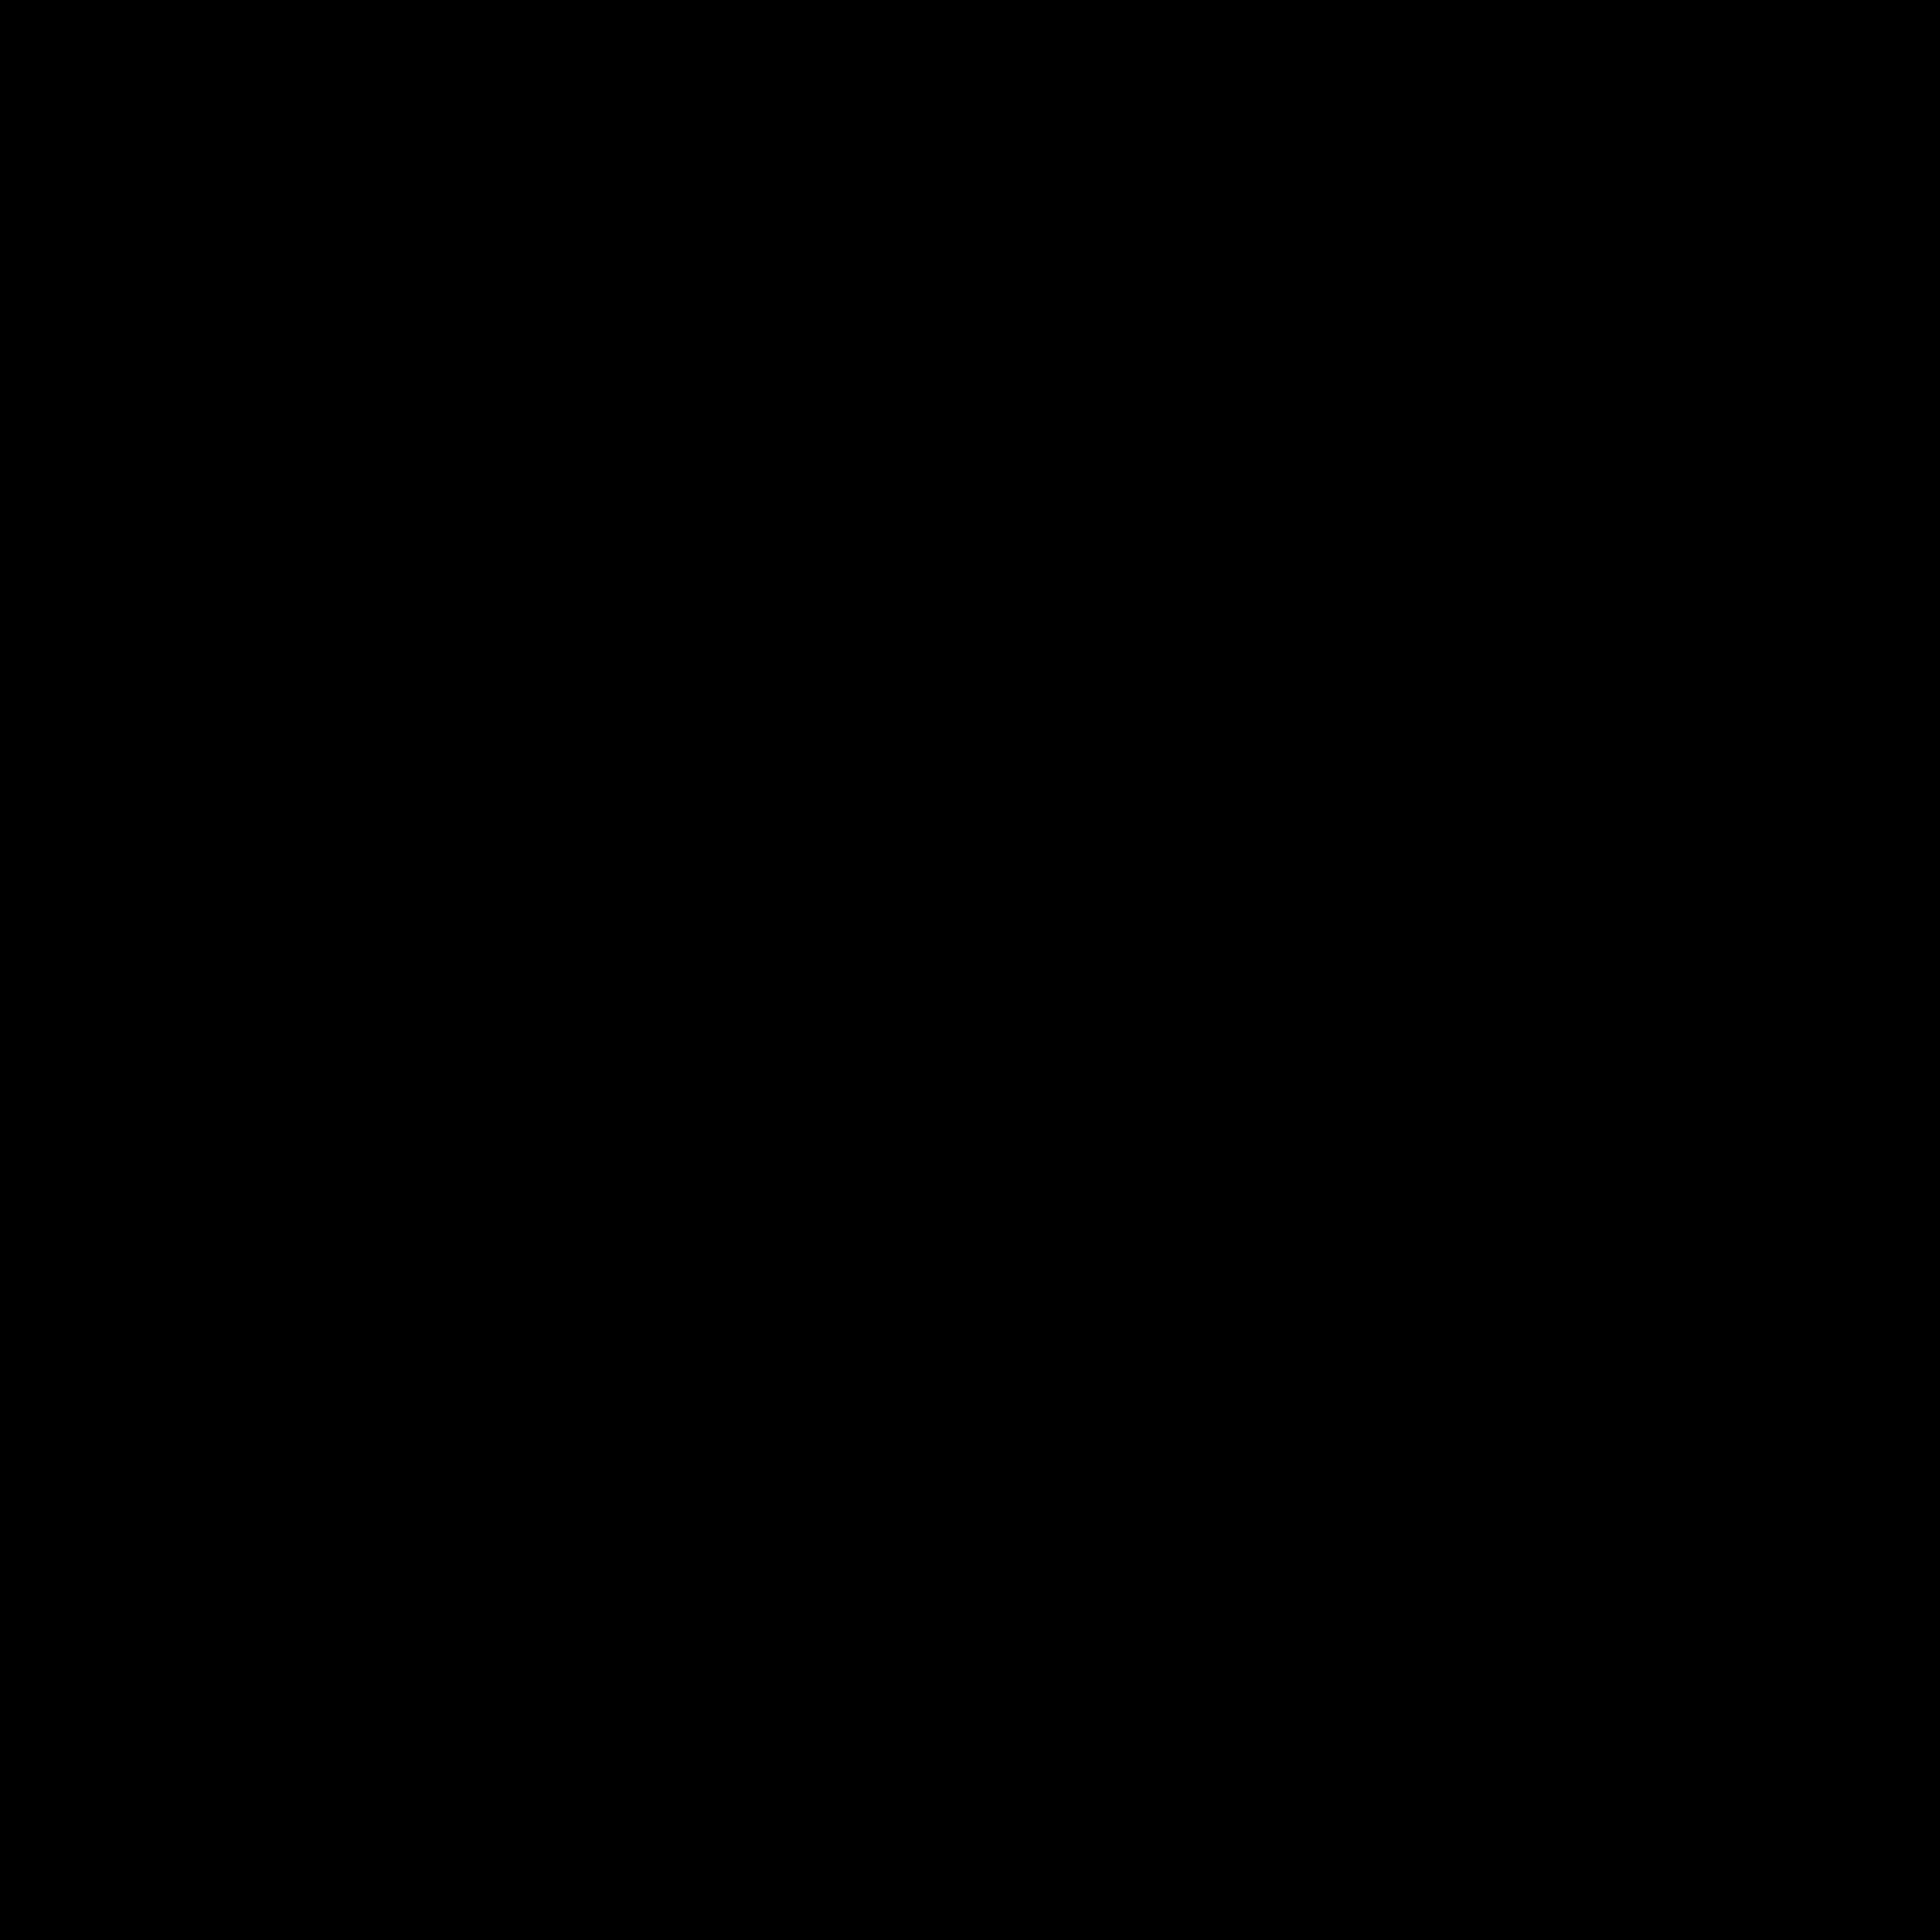 ABB Logo PNG Transparent & SVG Vector.